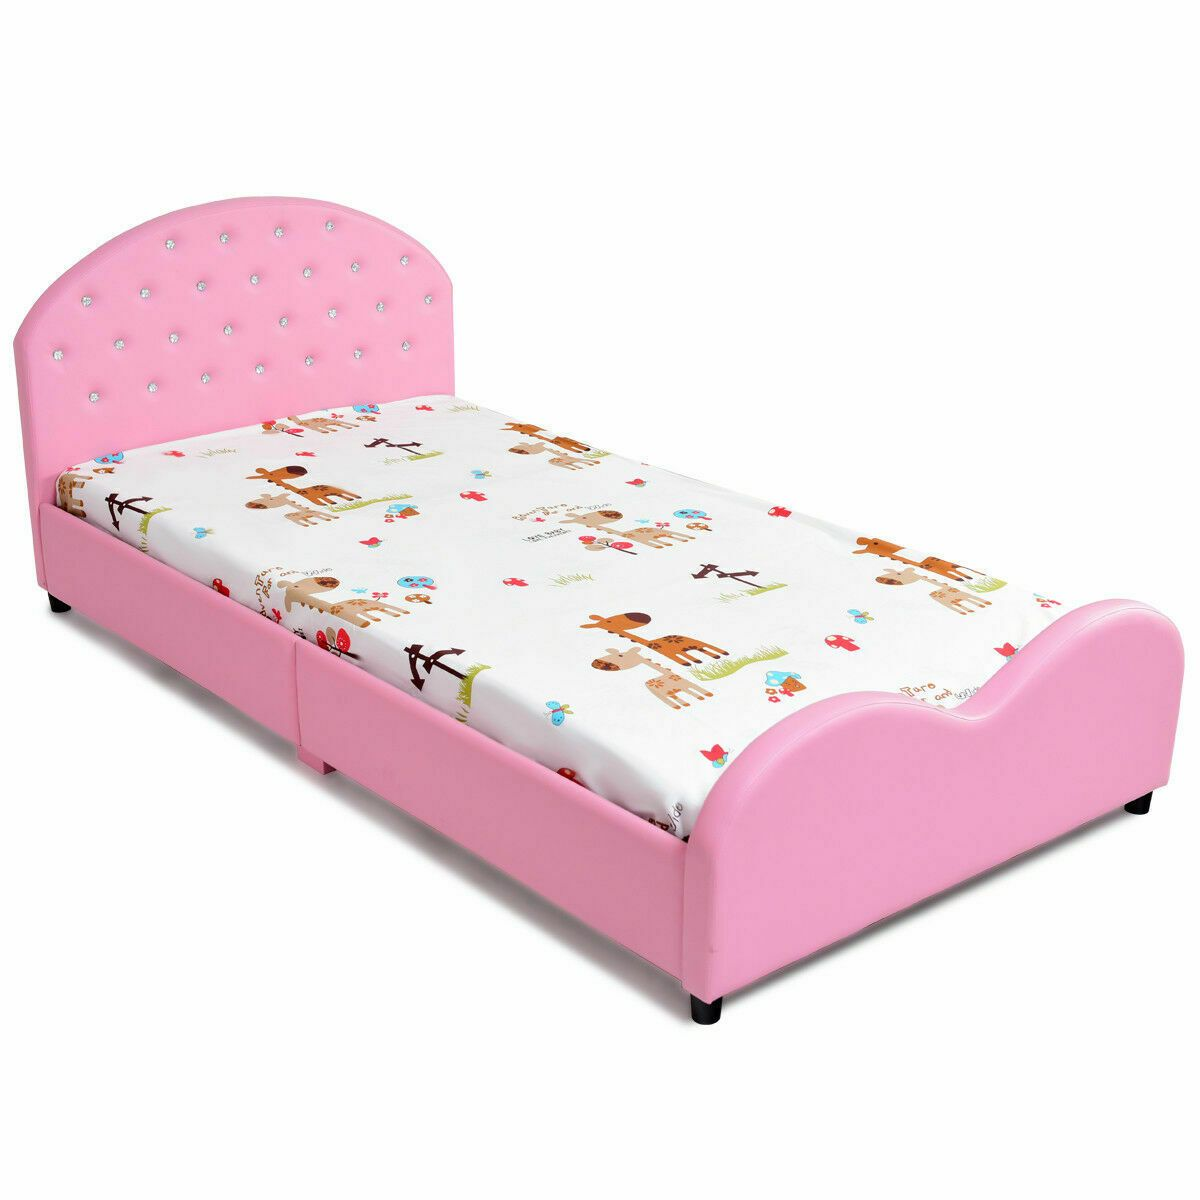 Kids Children Pu Upholstered Platform Wooden Princess Bed Twin